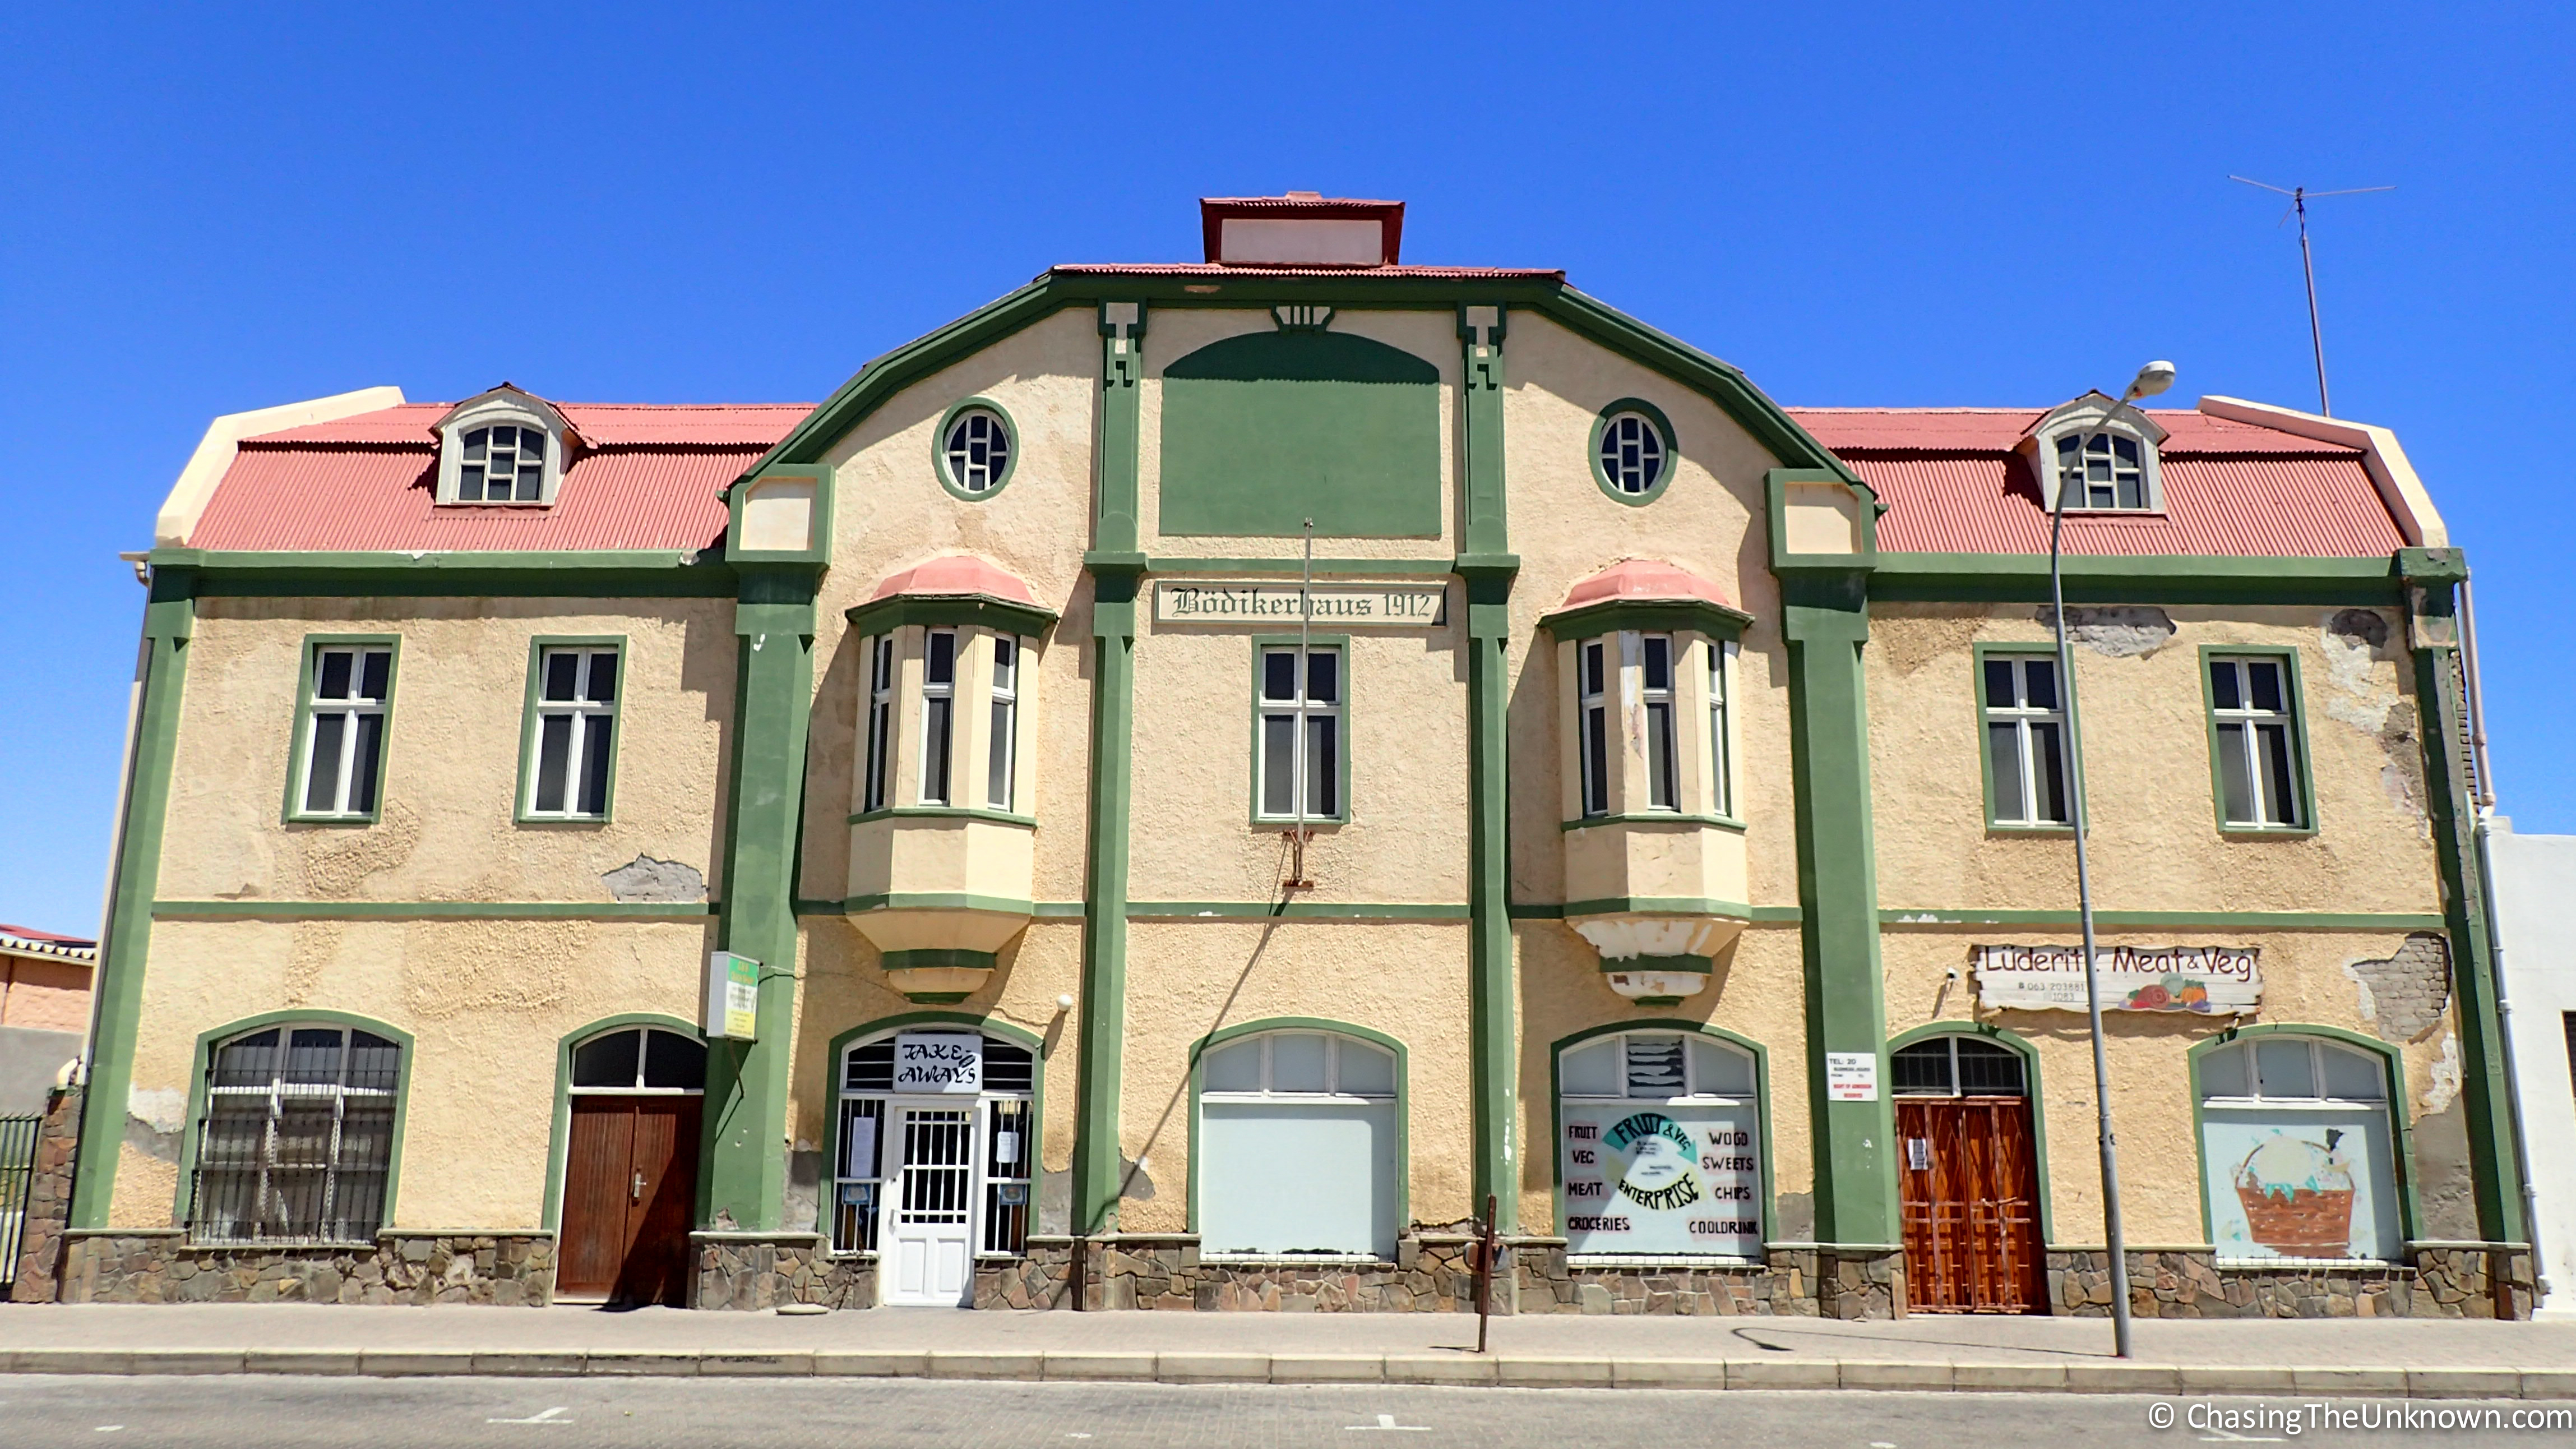 bodikerhaus-lüderitz